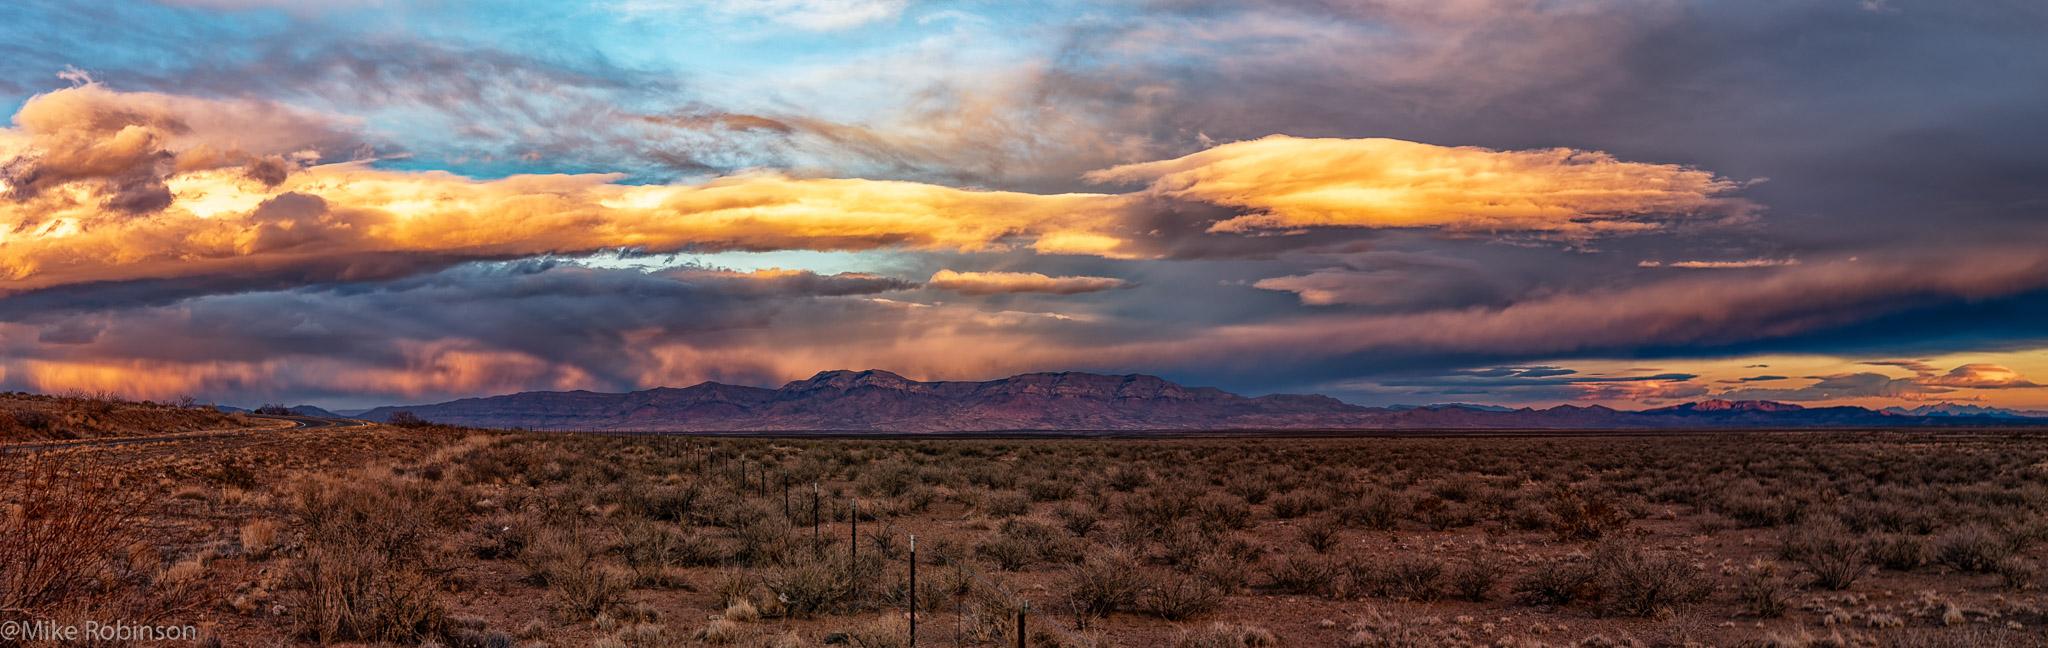 New Mexico Evening Scene.jpg